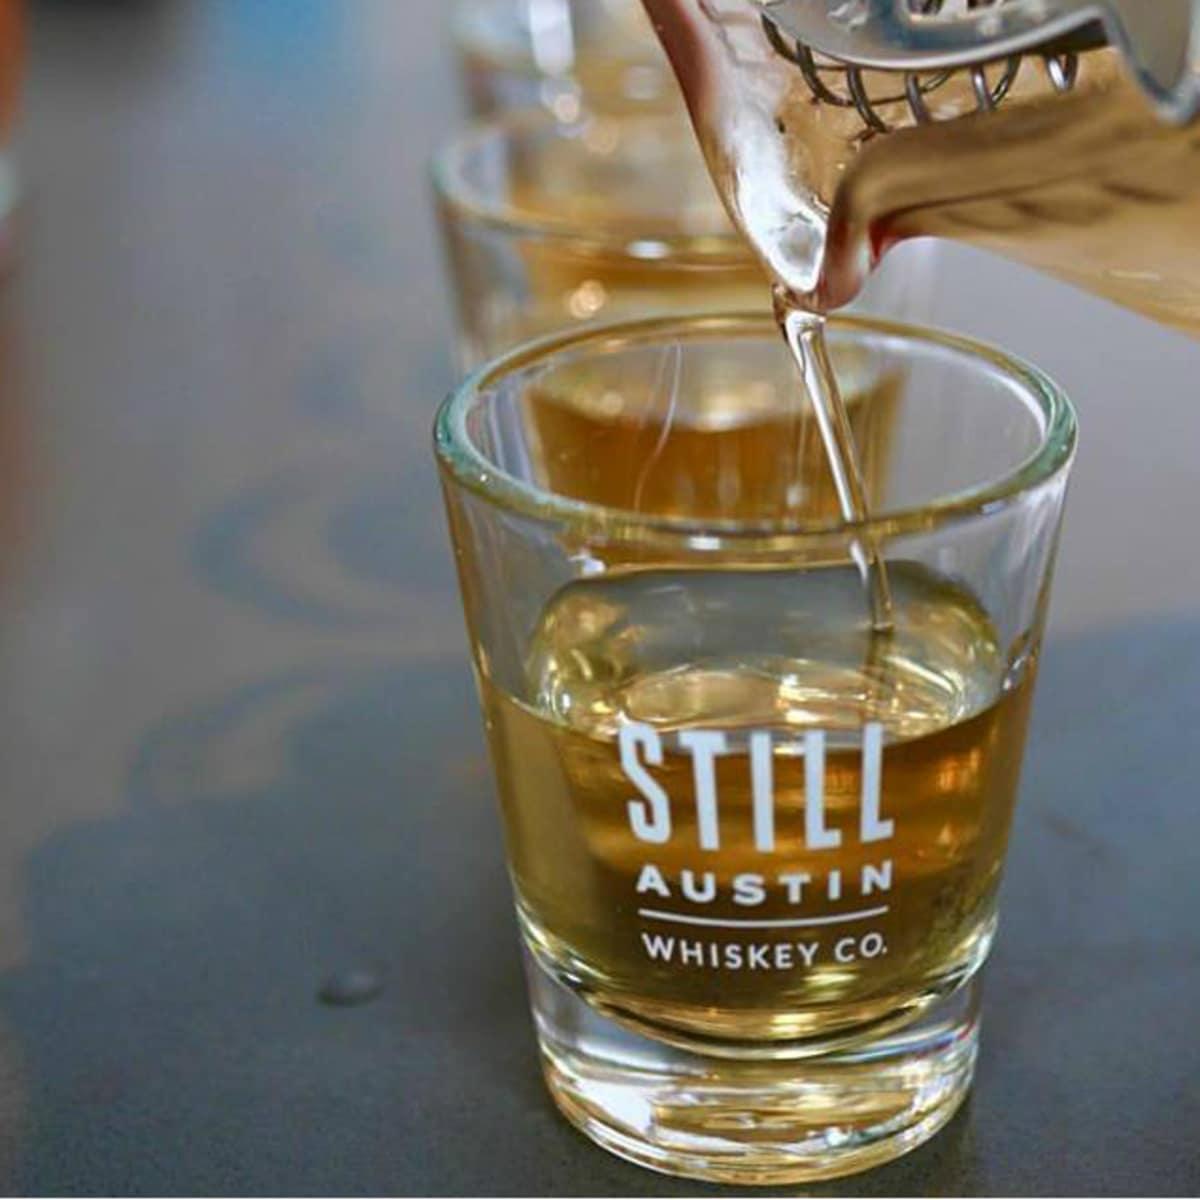 Still Austin Whiskey being poured